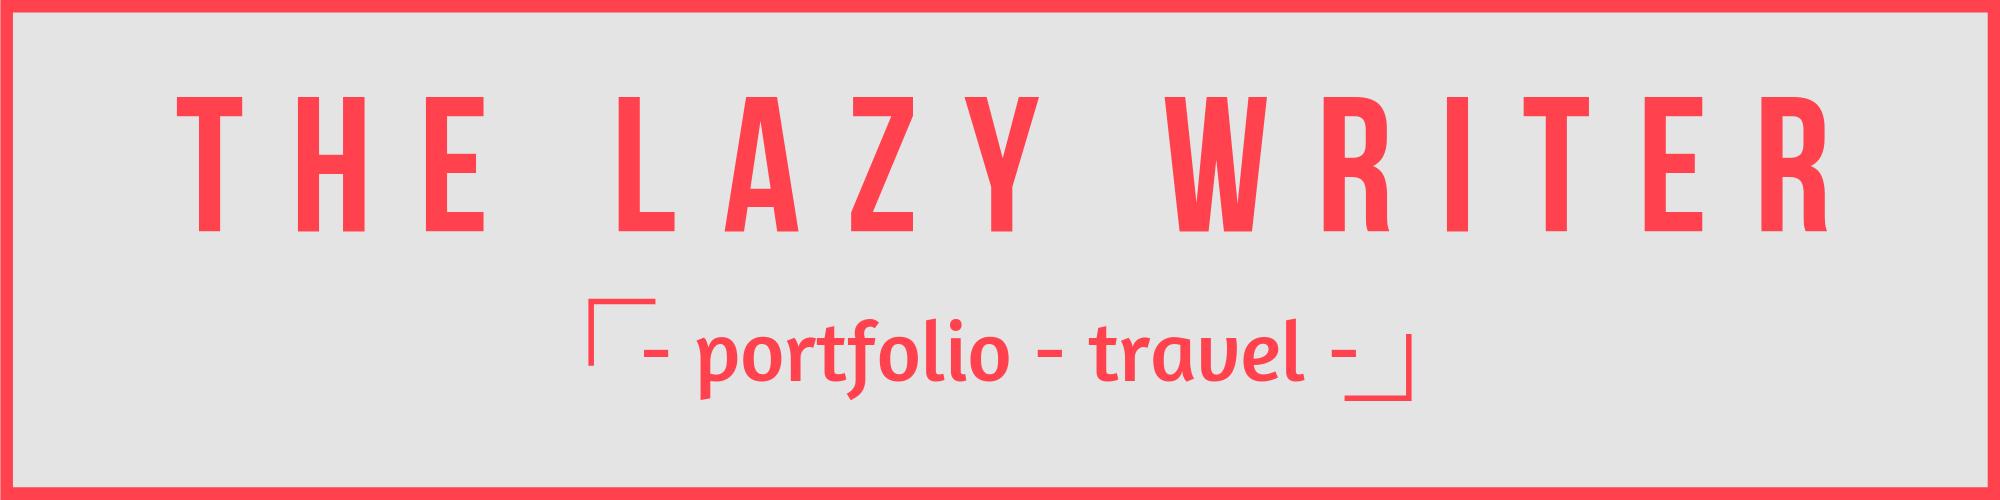 portfolio-travel